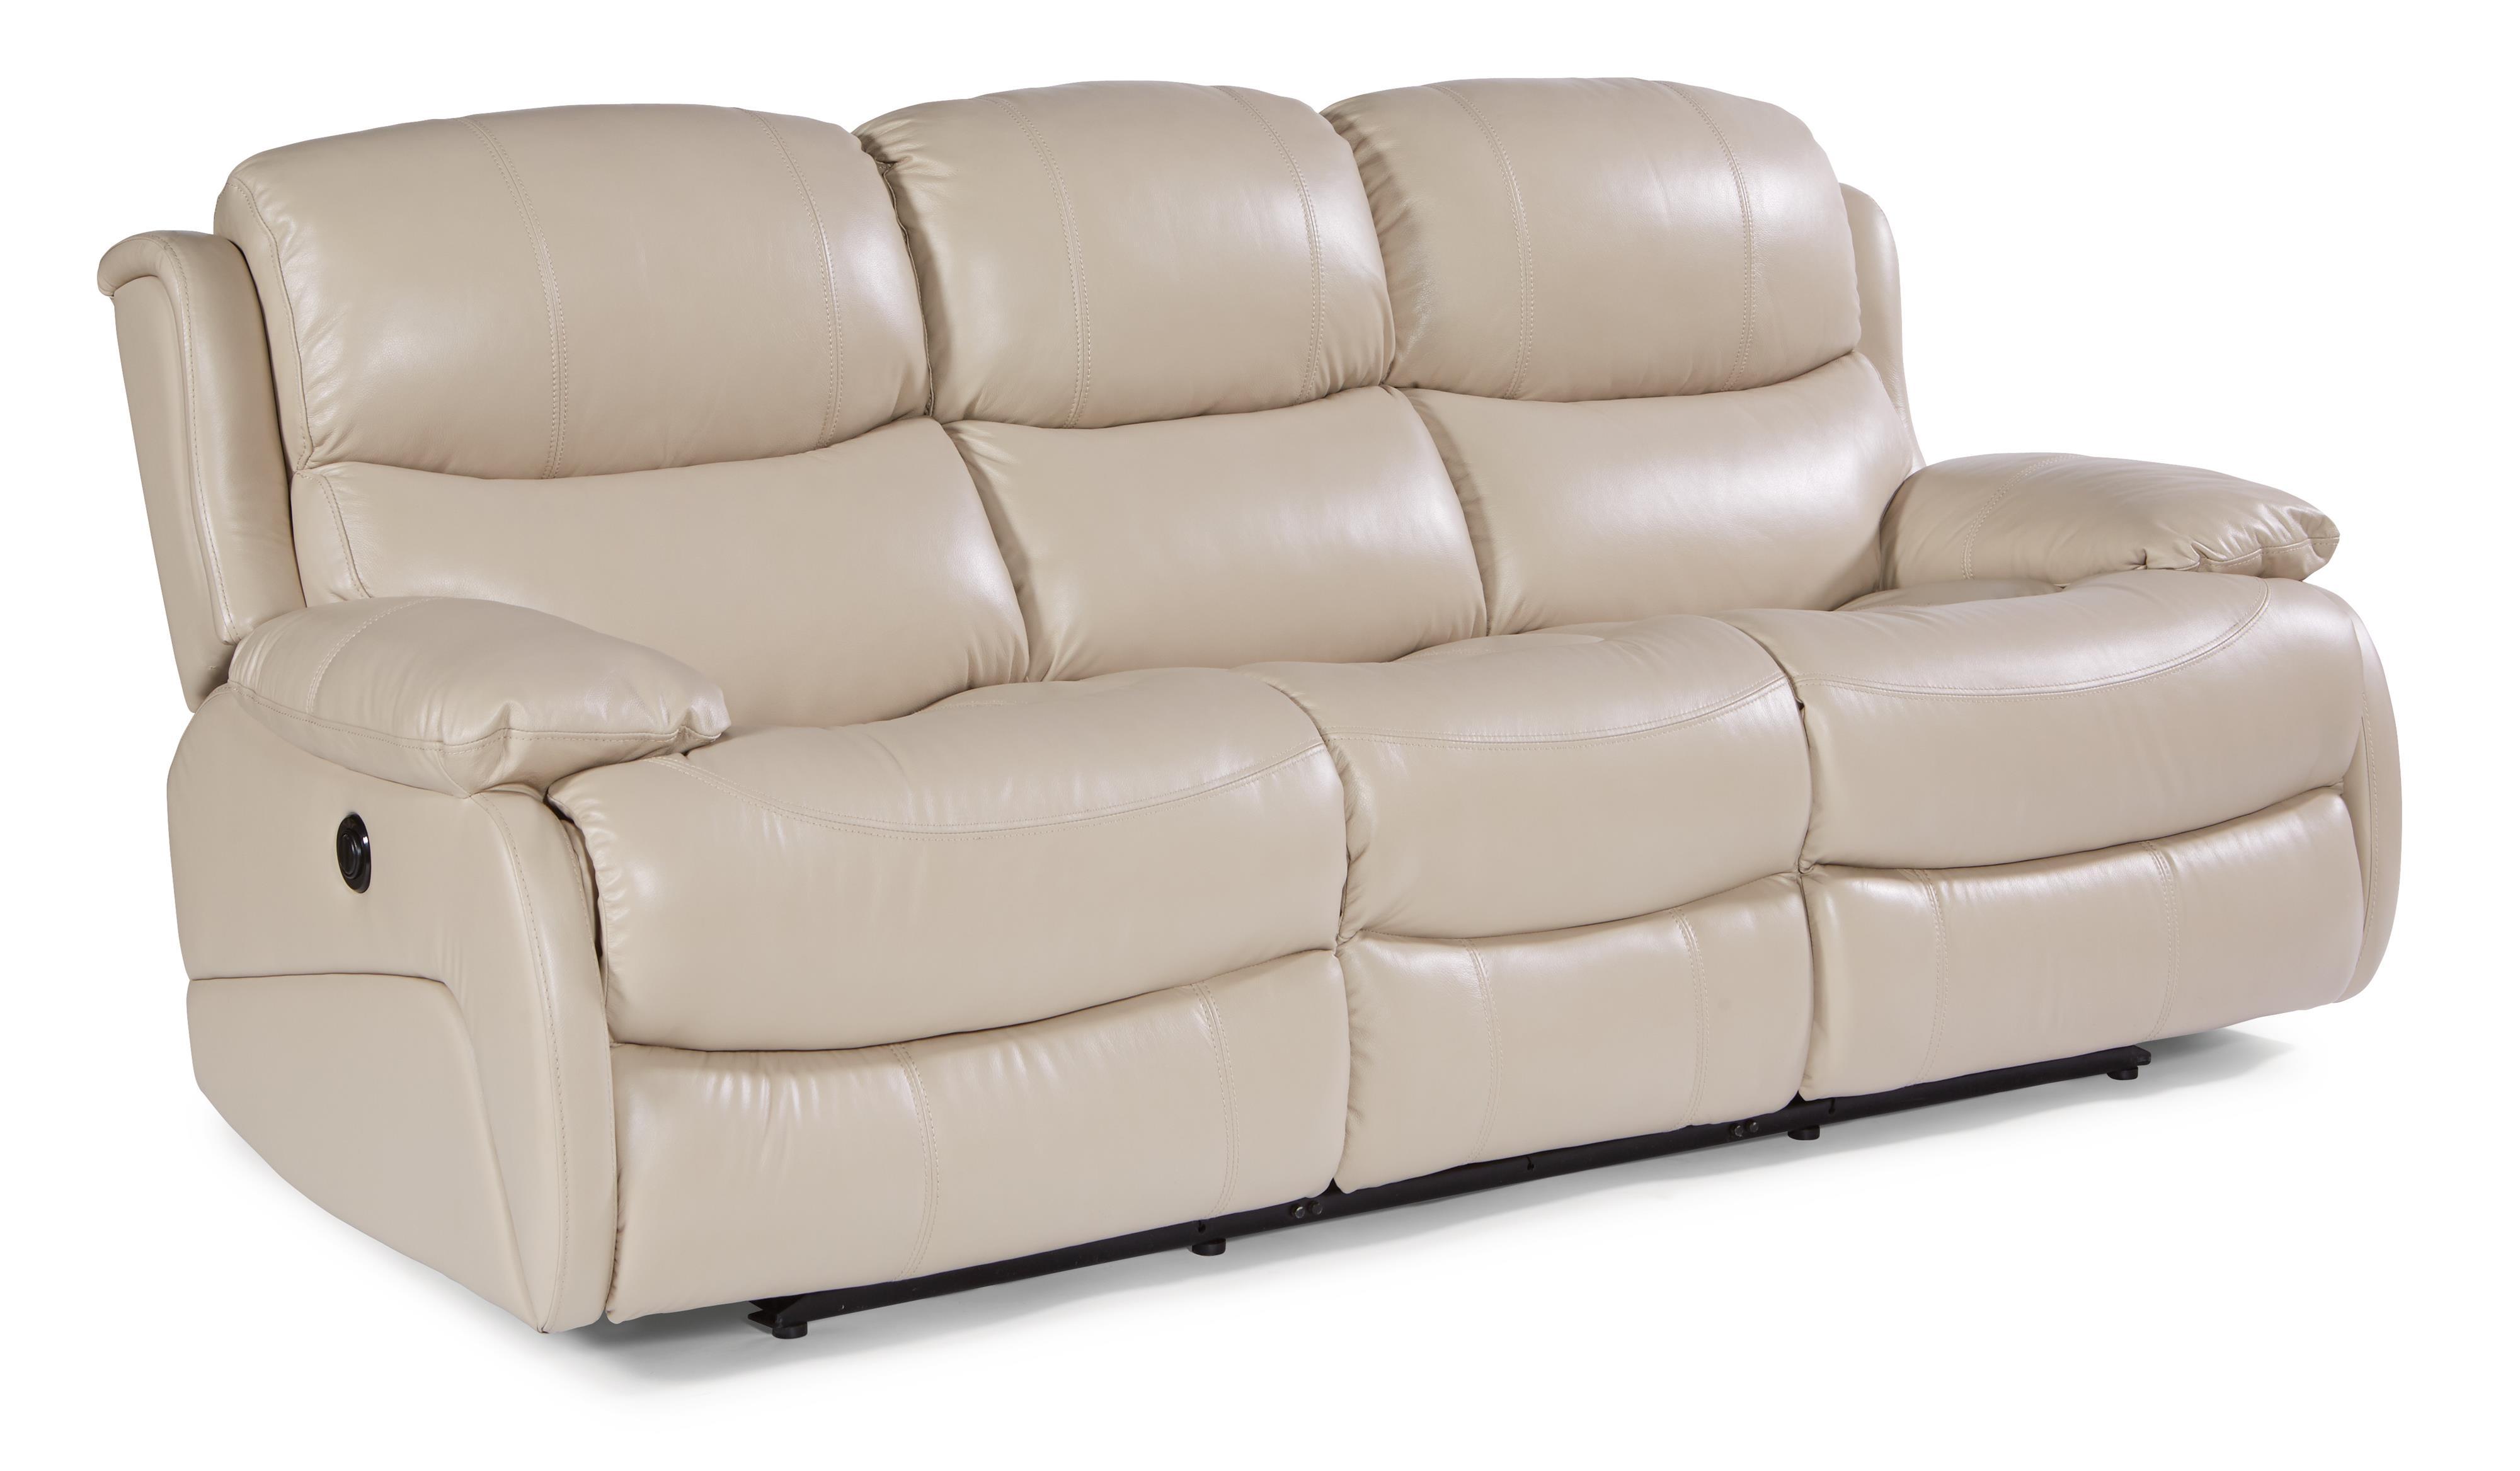 Flexsteel latitudes amsterdam power double reclining sofa reeds furniture reclining sofas - Sofa reclinable ...